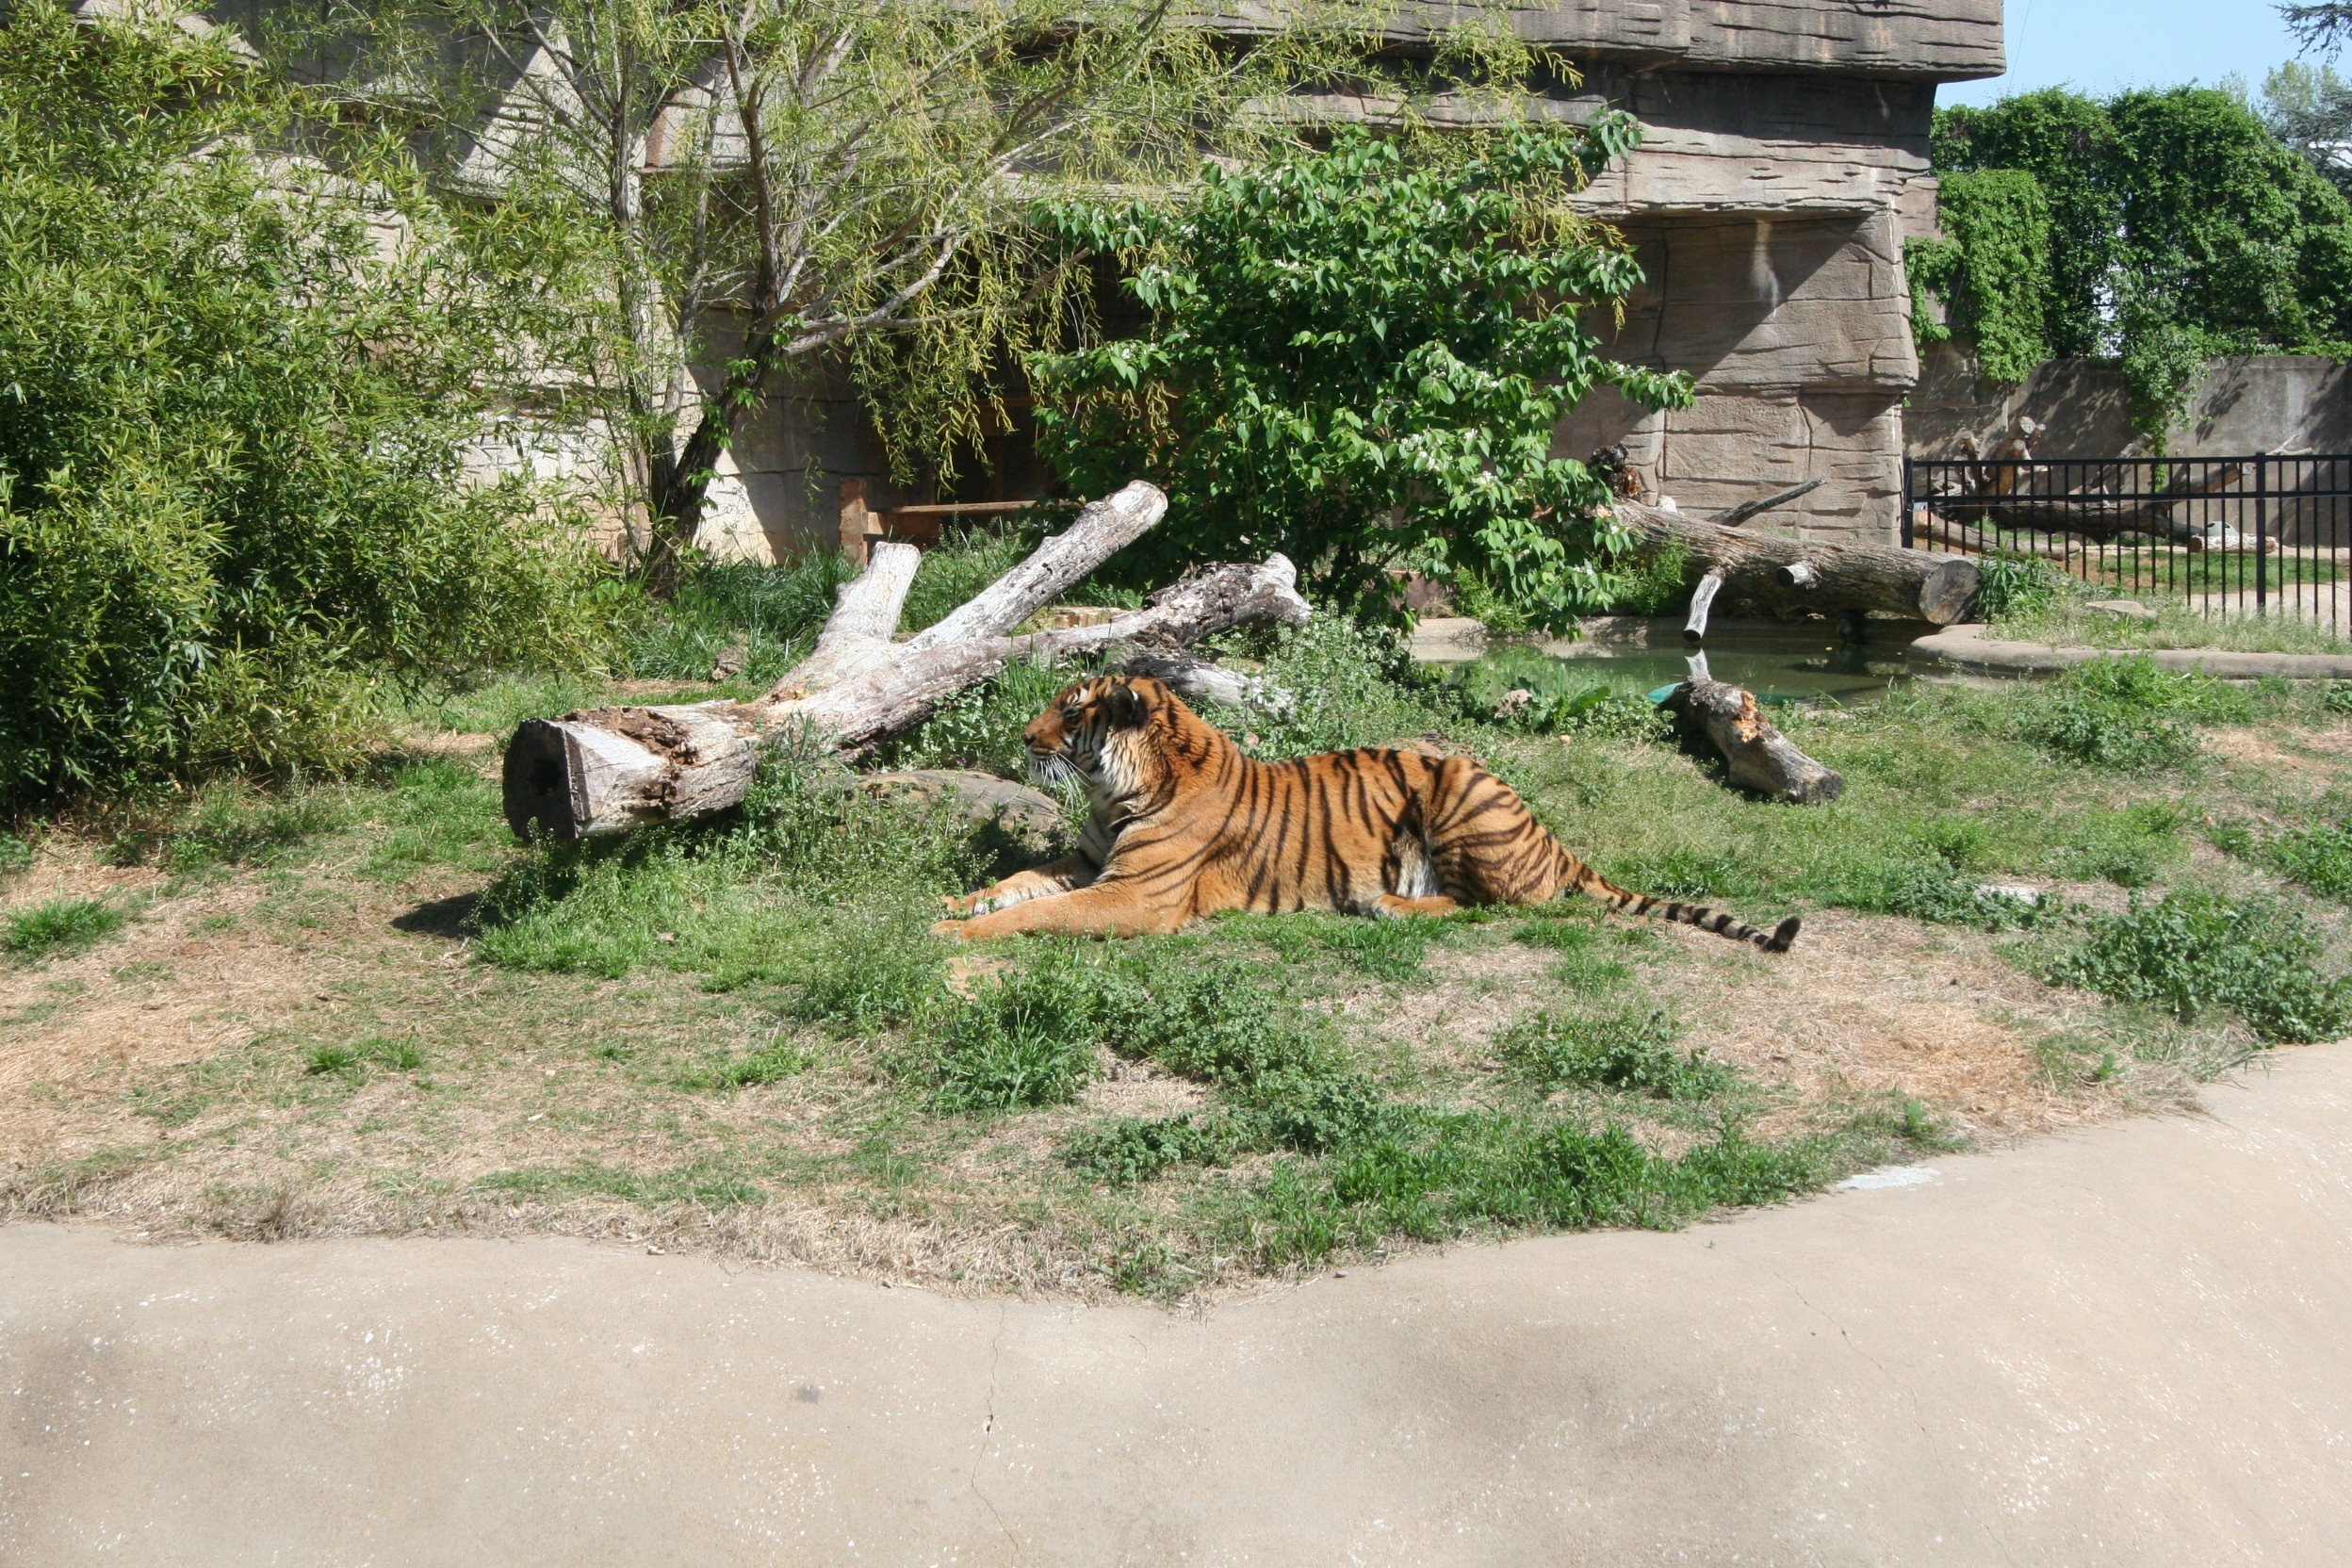 #TulsaZoo: Tiger, Seals & a Gator